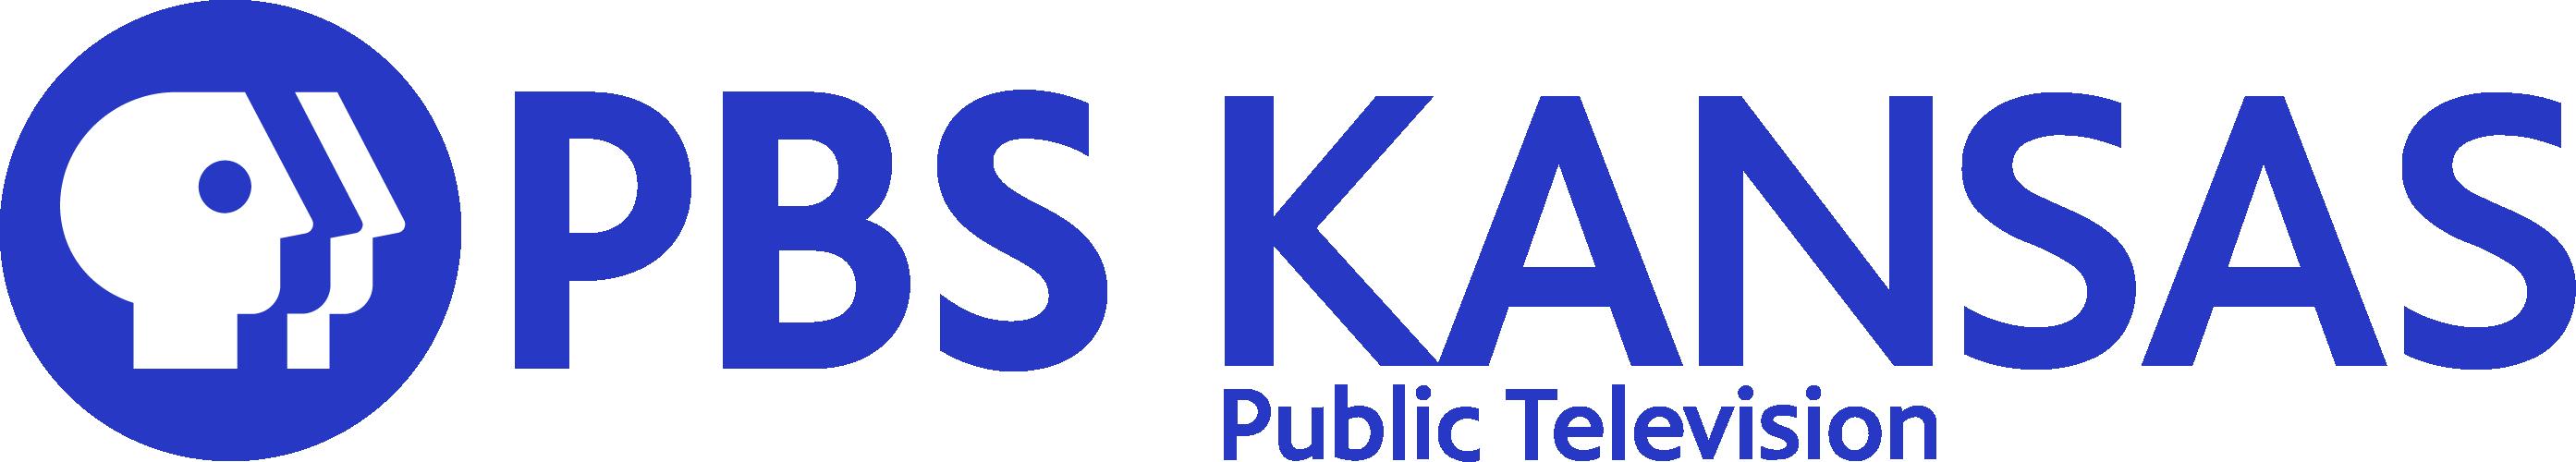 PBS Kansas Public Television